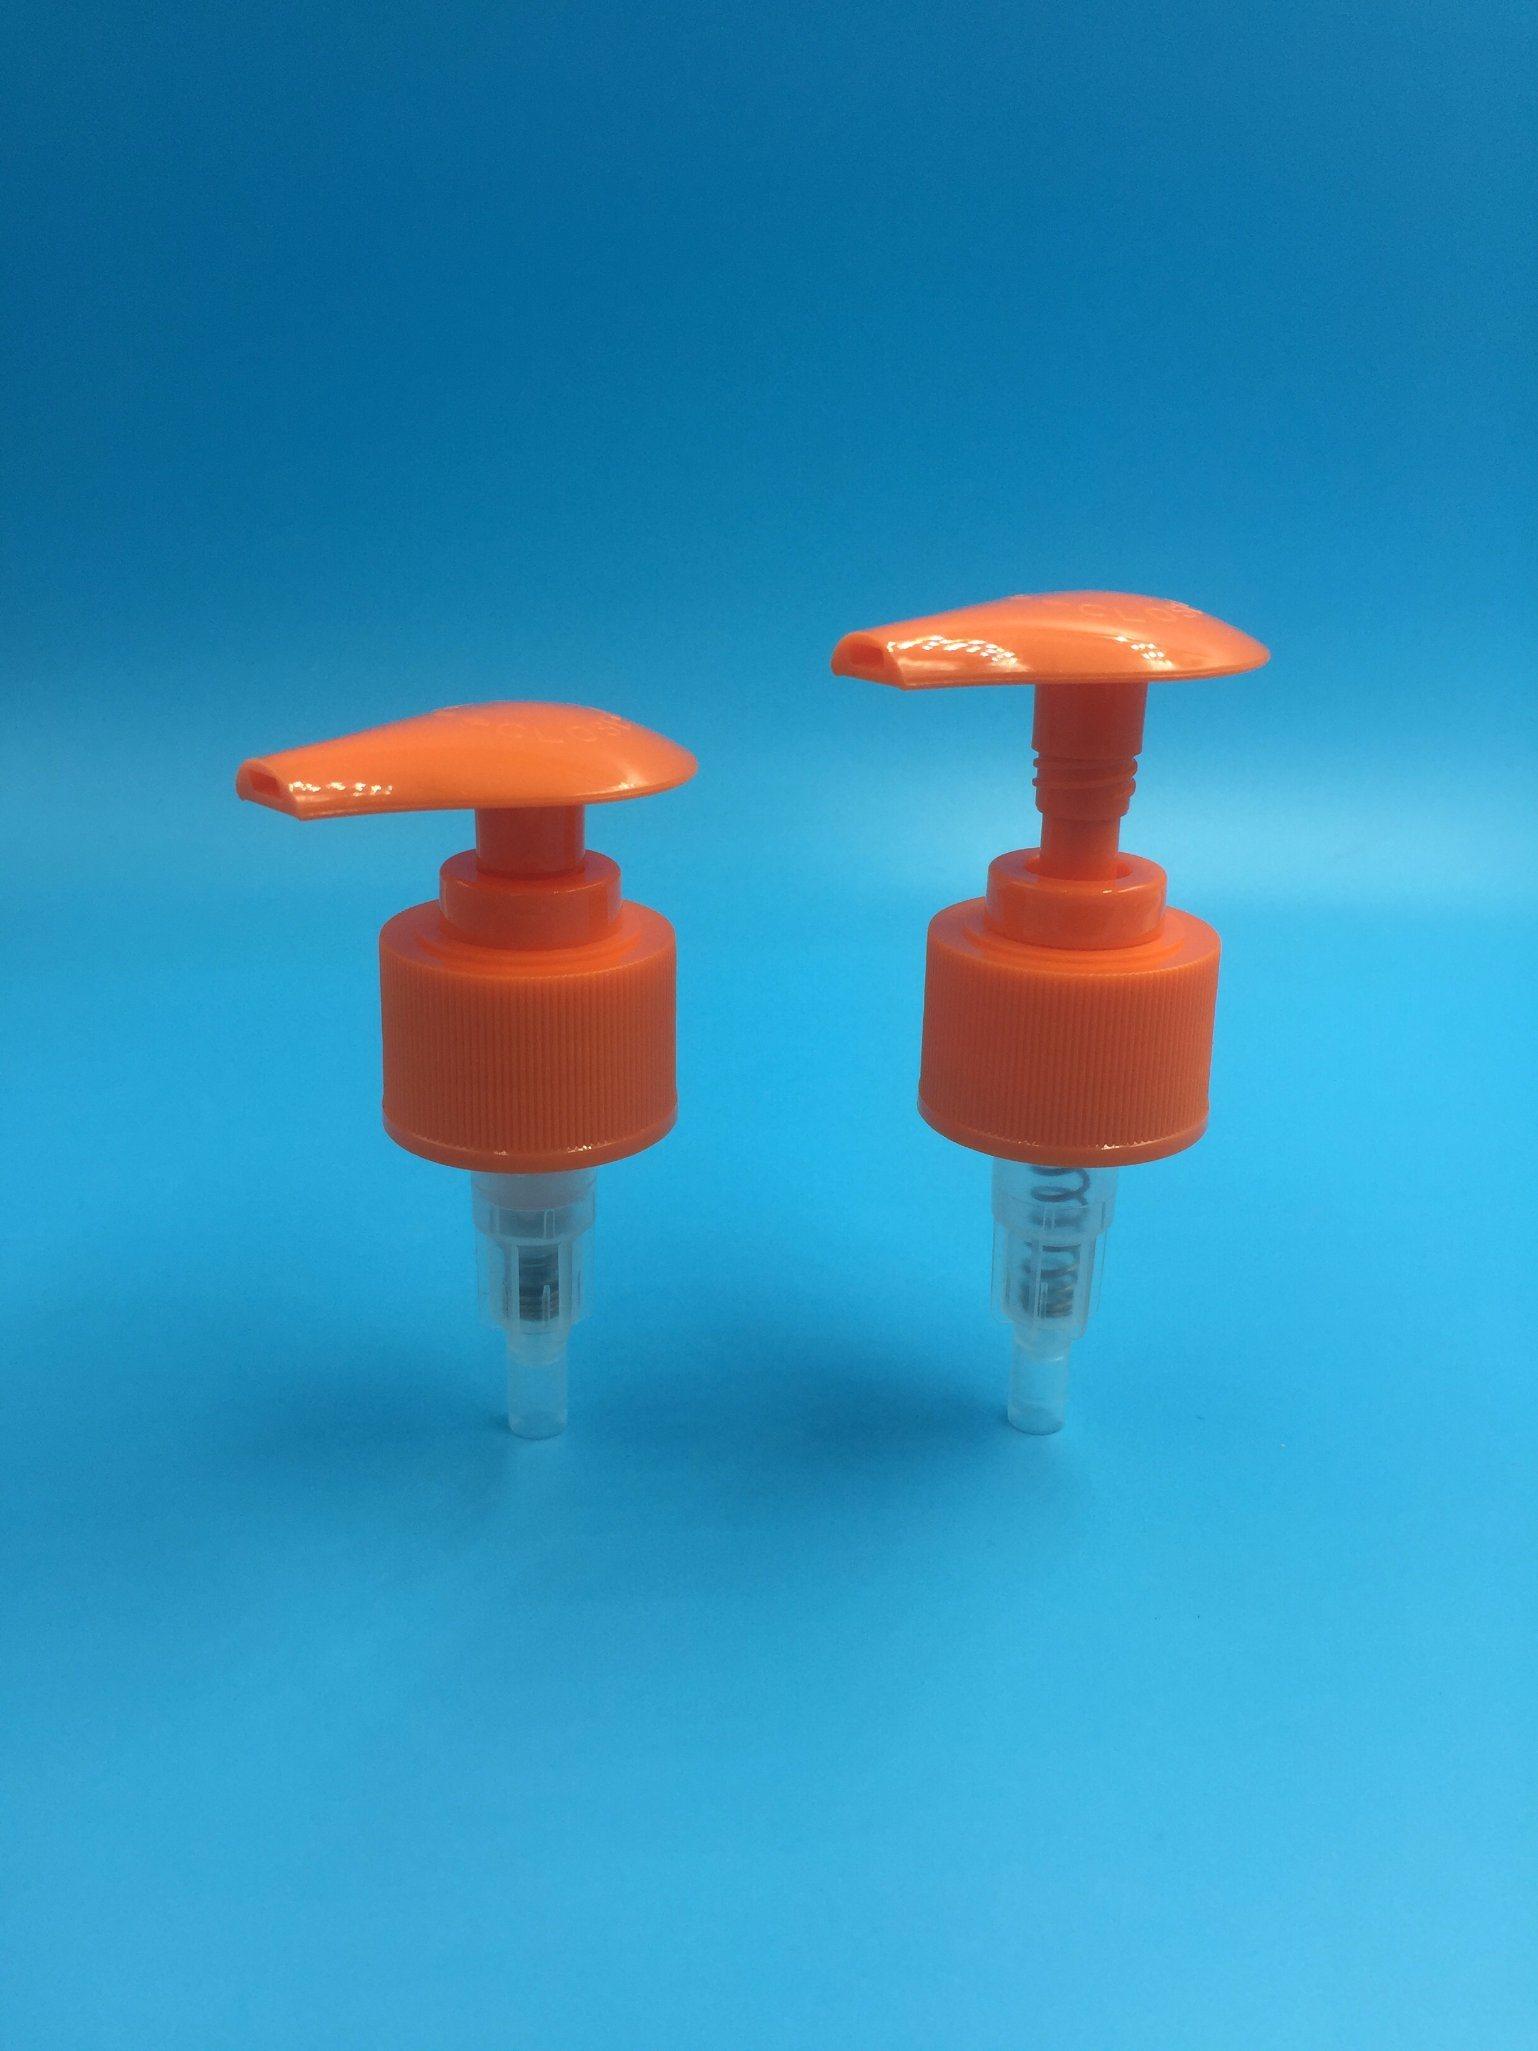 24/410 28/410 Plastic Lotion Pump for Soap Shampoo Lotion